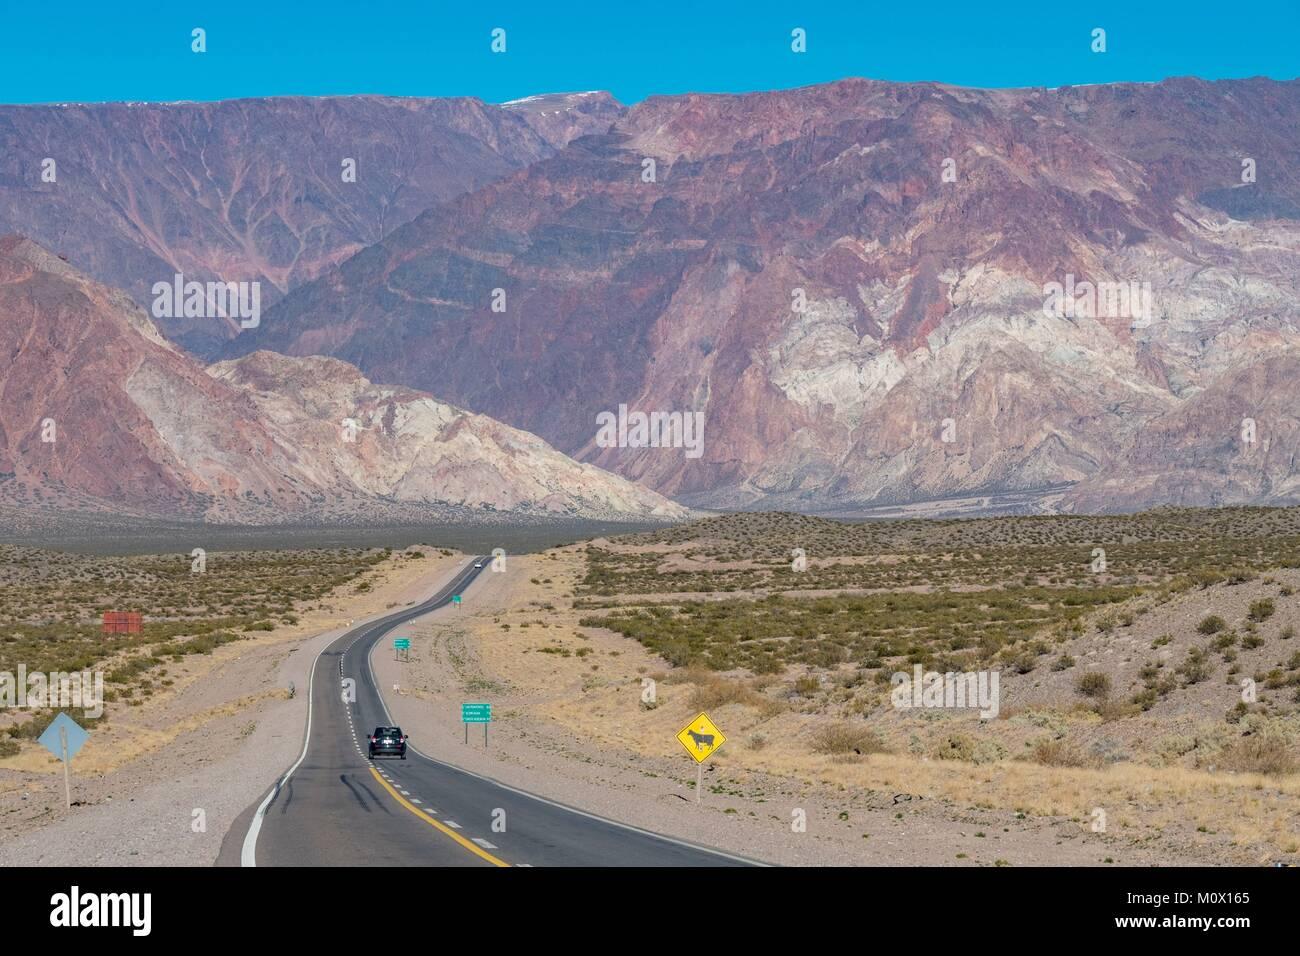 Argentina,Mendoza Province,Polvaredas,RN 7 road to Chilean frontier - Stock Image